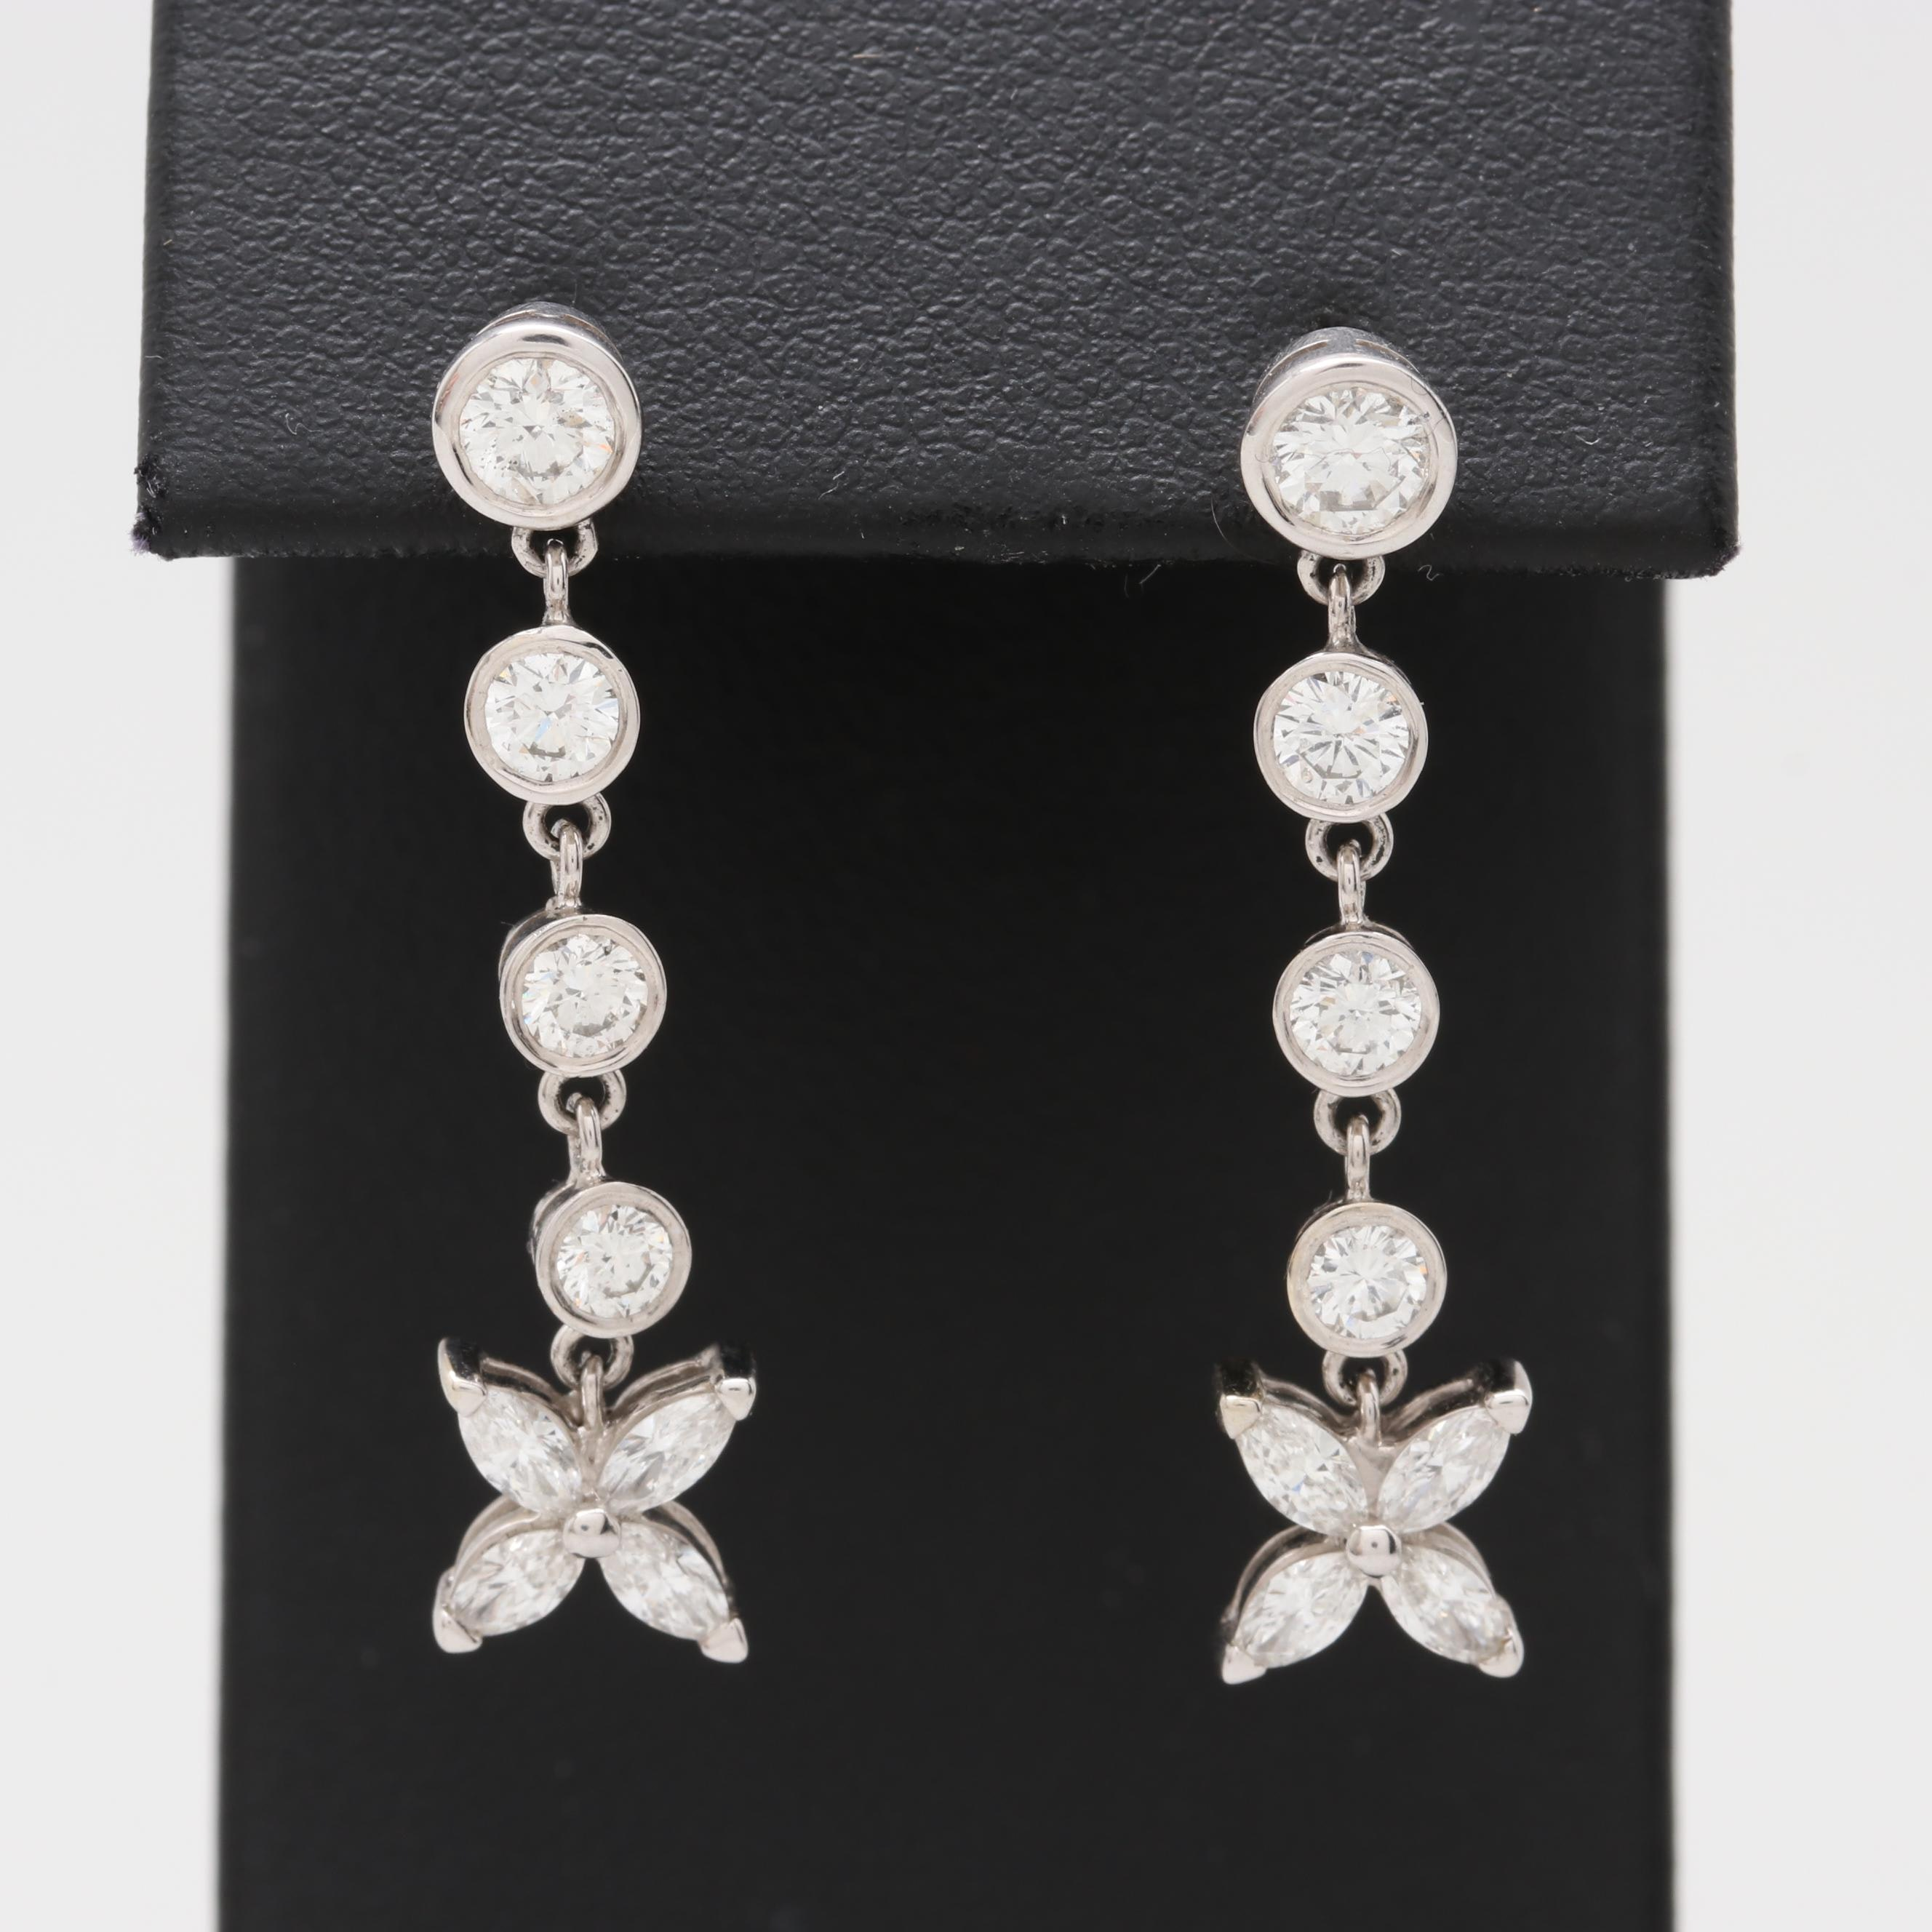 14K White Gold 2.24 CTW Diamond Drop Earrings